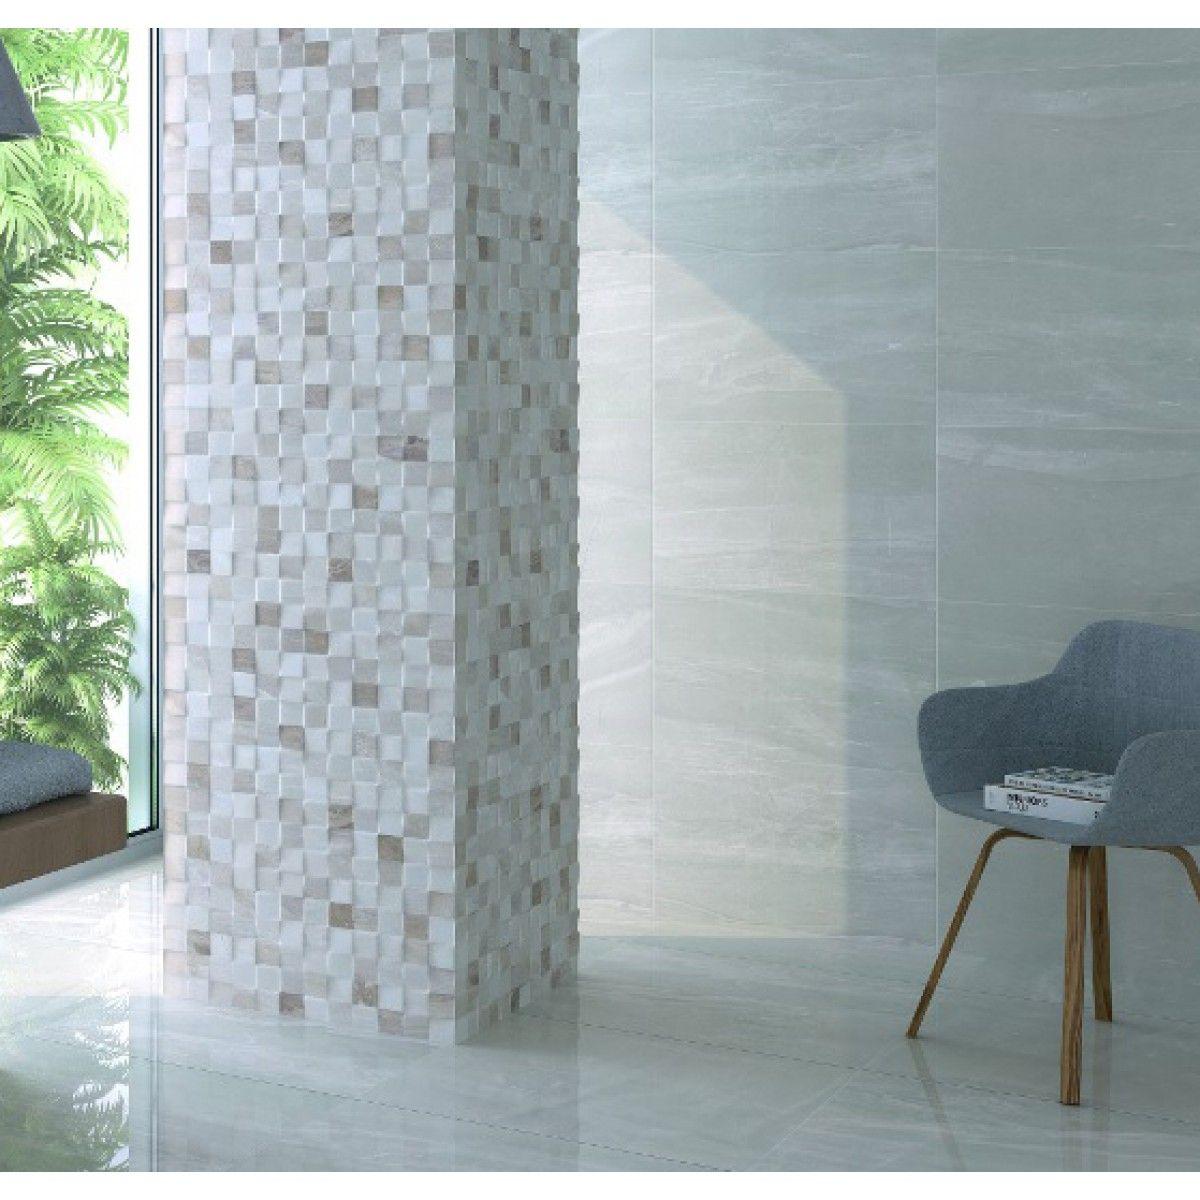 Atrium Kios Pearla 550mm X 333mm Wall Floor Tiles Wall Tiles